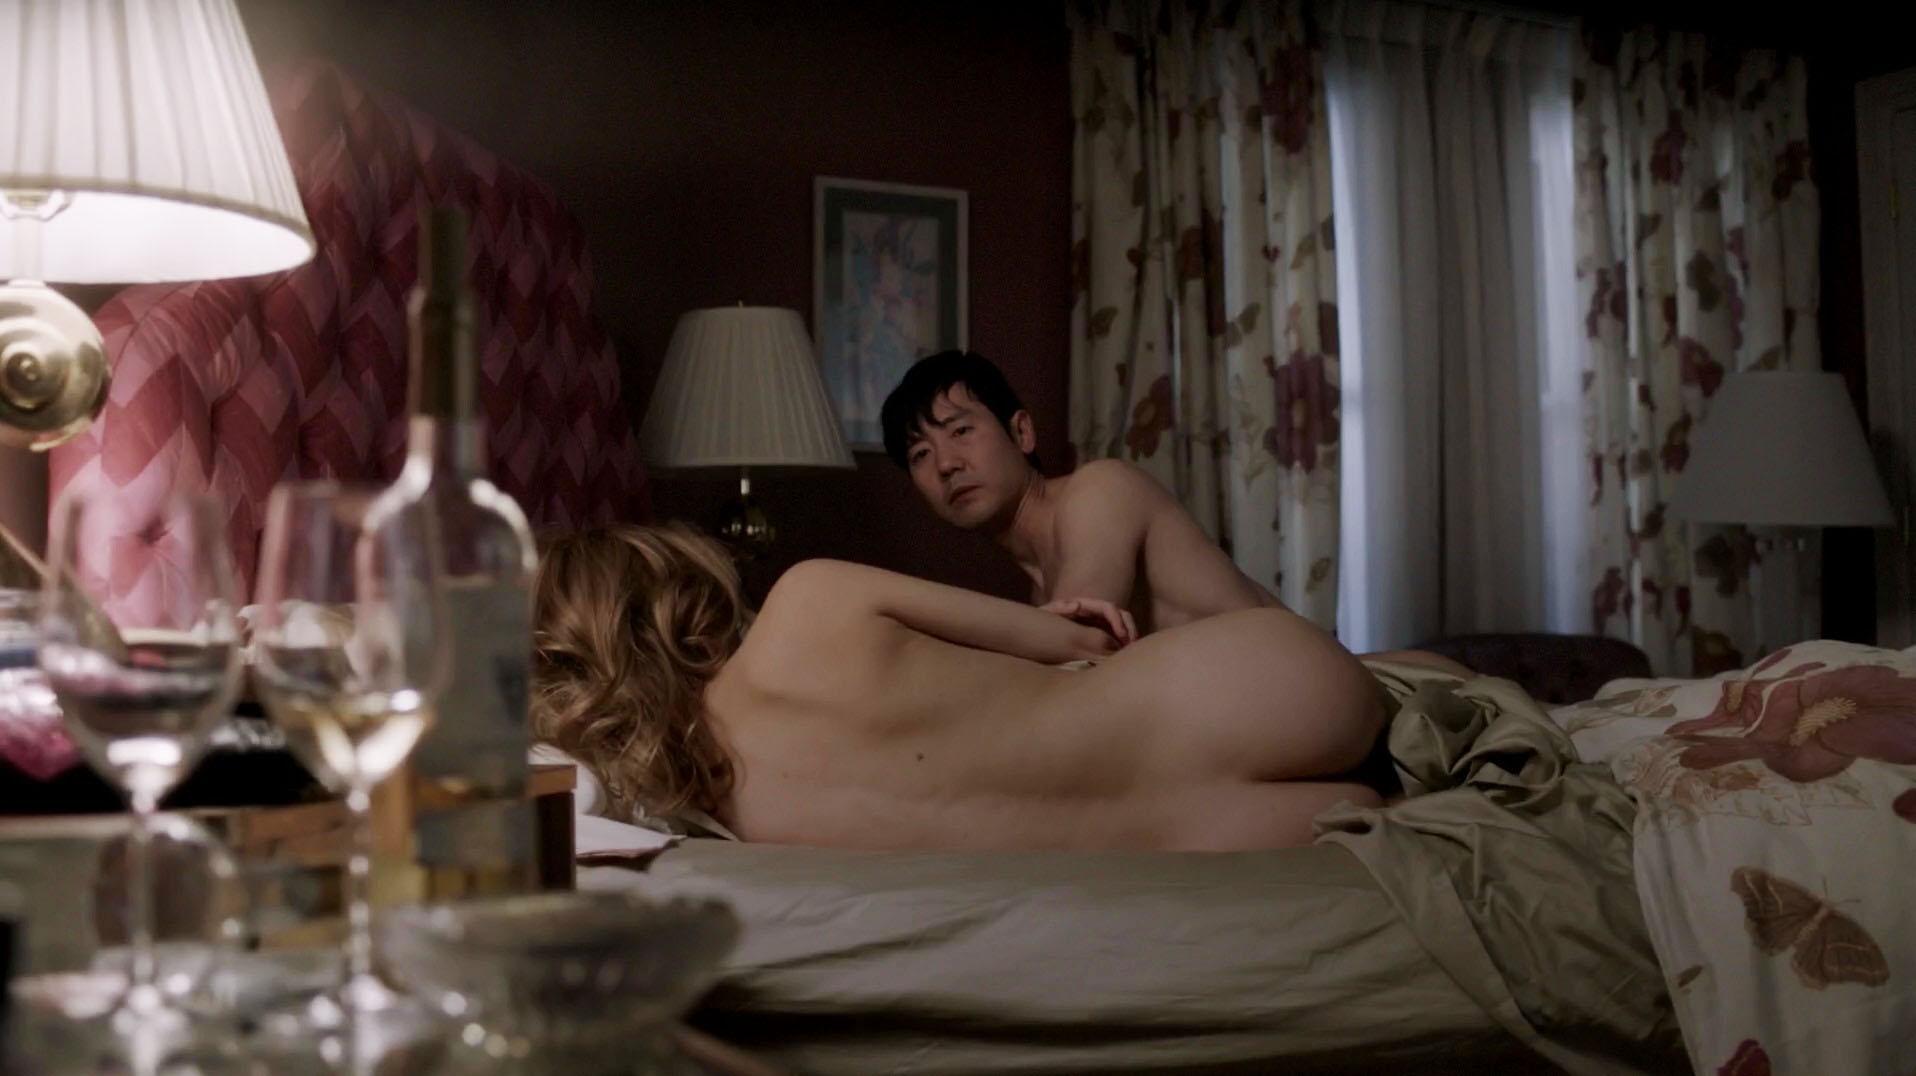 Erotica Keri Russell nude (35 photos), Sexy, Paparazzi, Instagram, cleavage 2018